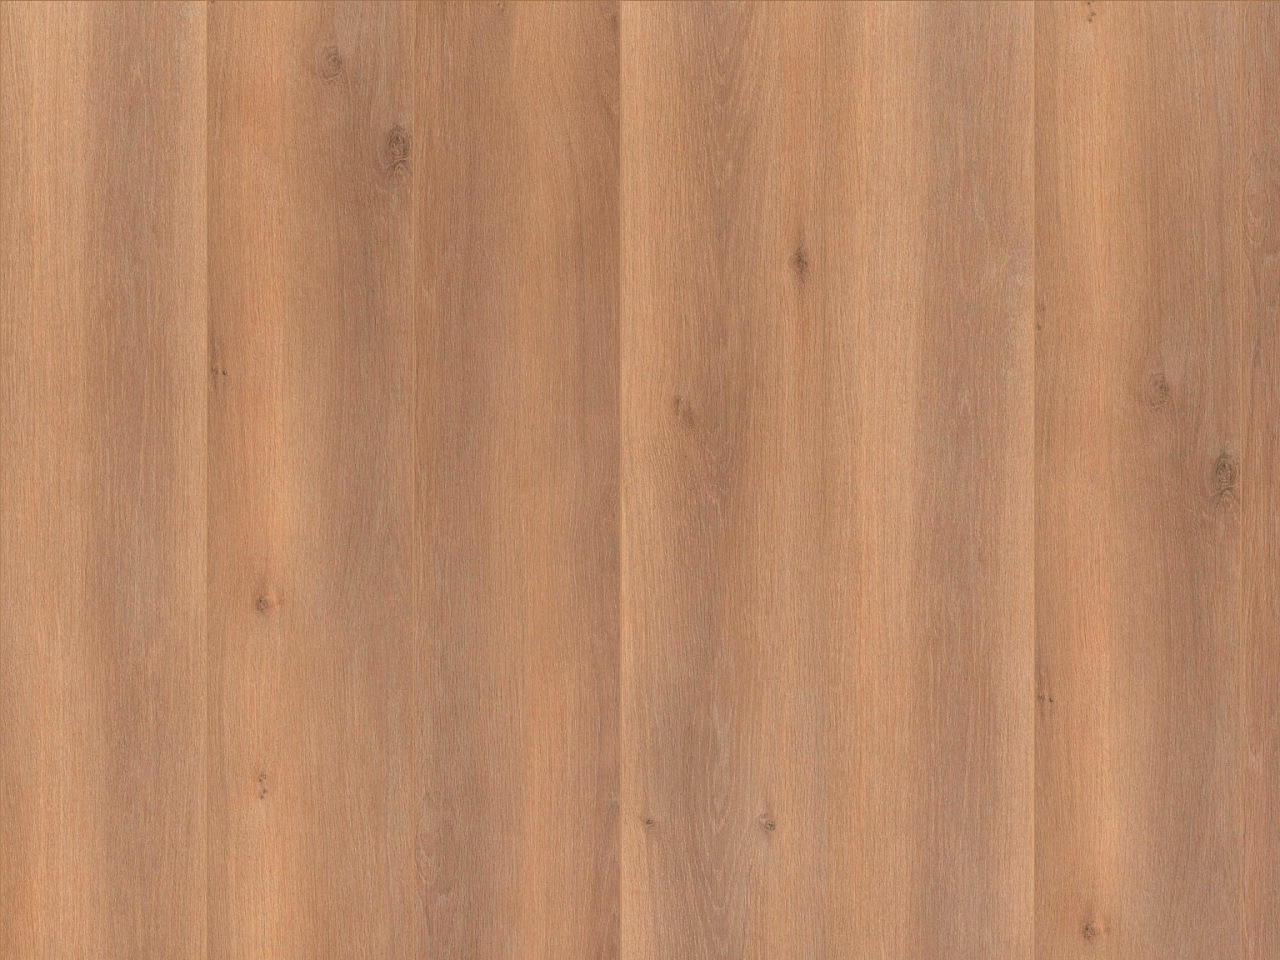 Laminatboden Oak Gallery Format L – Calm Oak brown, LV4166